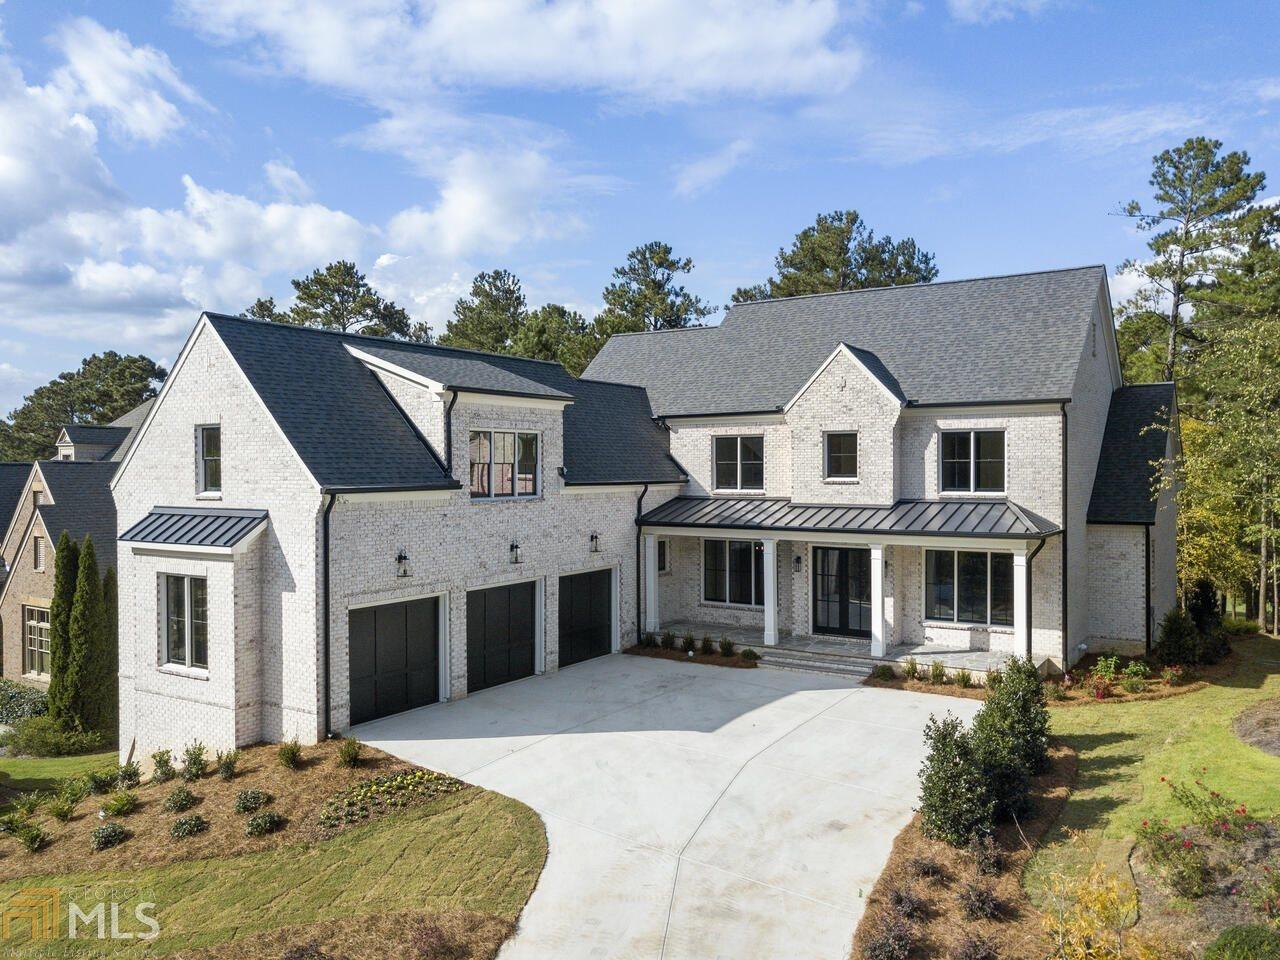 6054 Tattnall Overlook, Acworth, GA 30101 - MLS#: 8876493